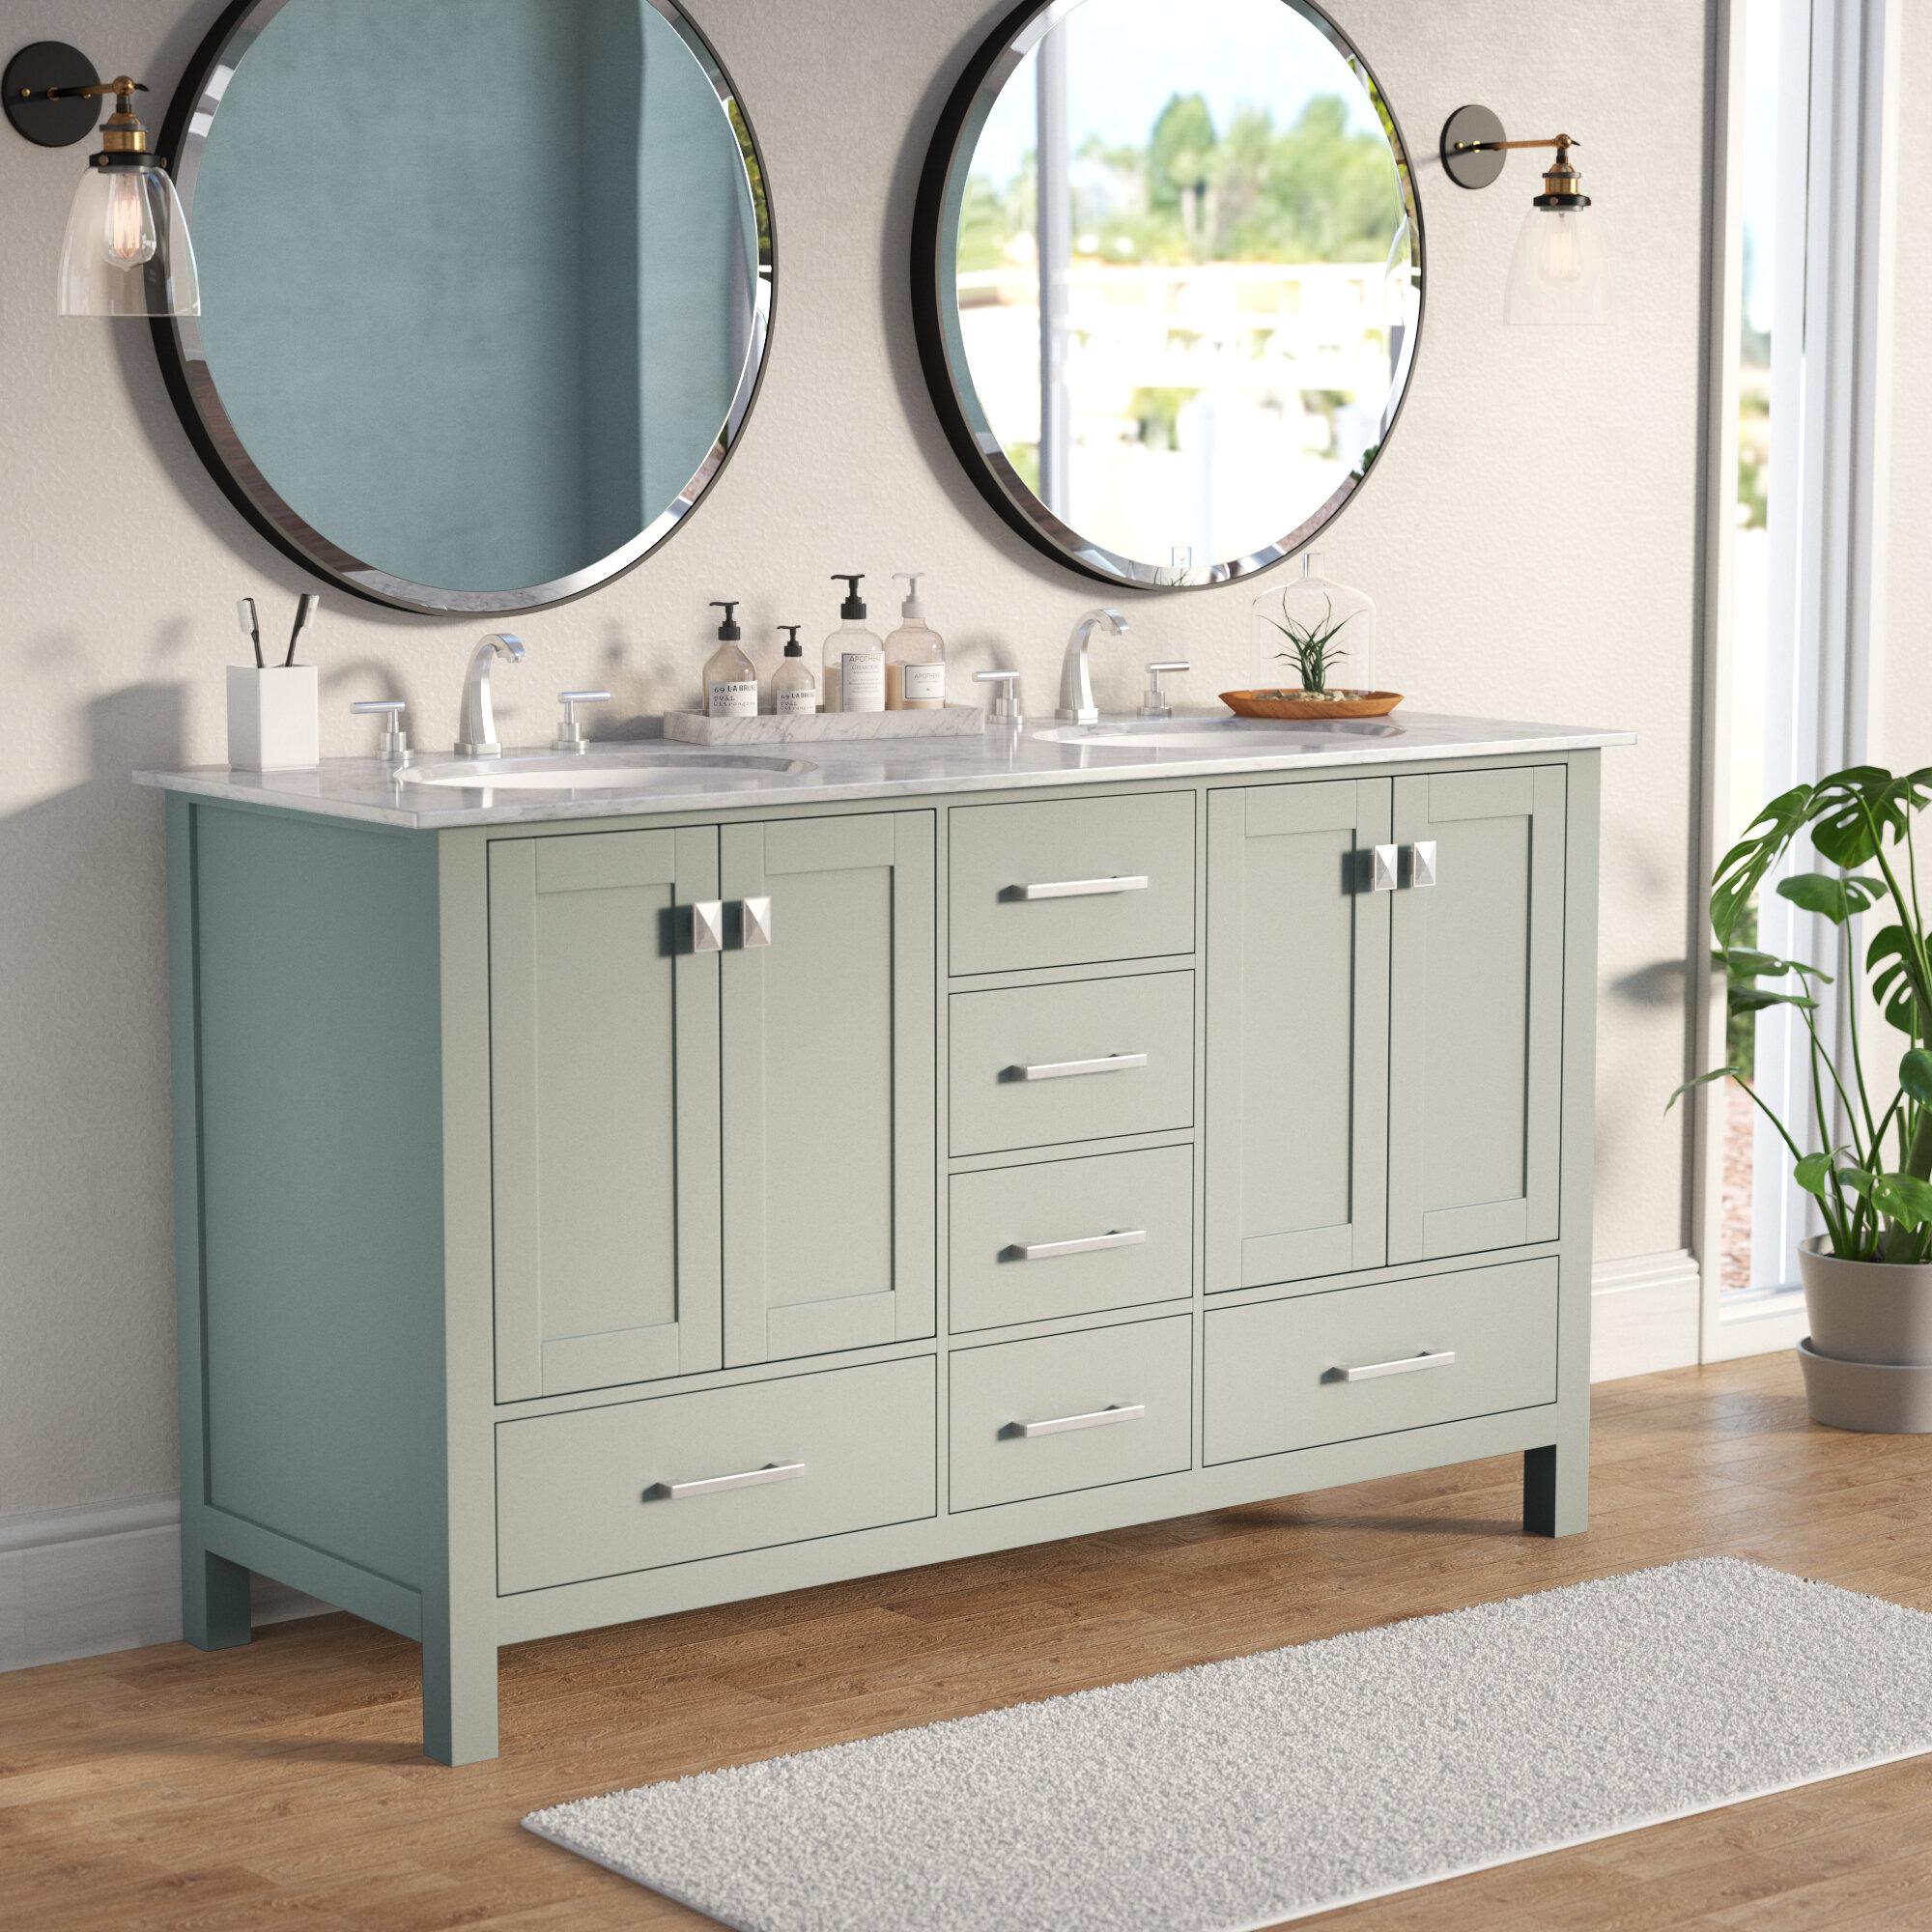 Darby Home Co Bowlin 60 Double Sink Bathroom Vanity Reviews Wayfair